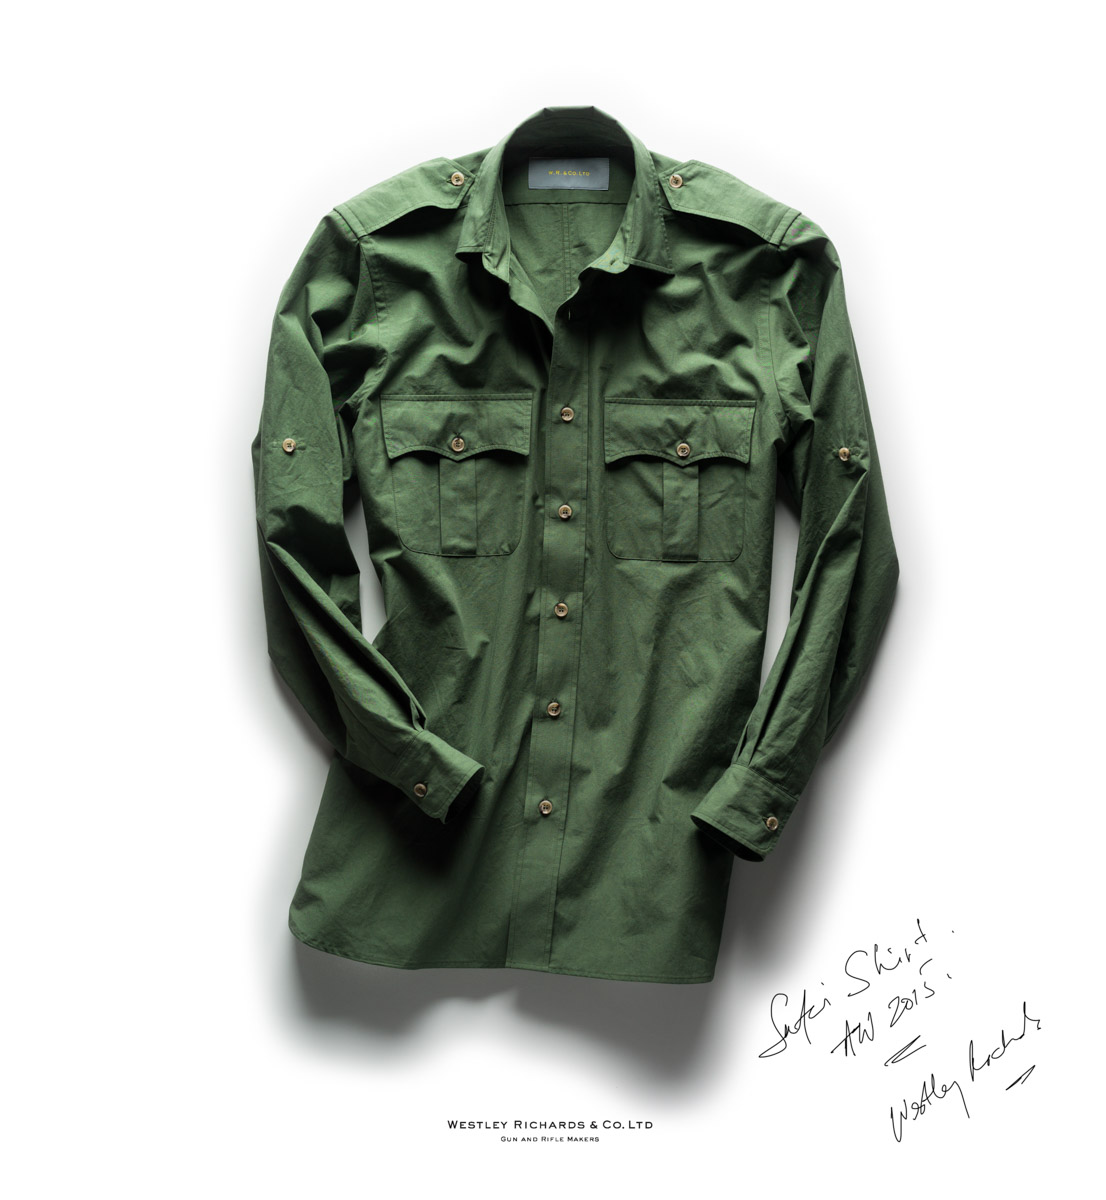 Safari Shirt, WR & Co. Westley Richards.